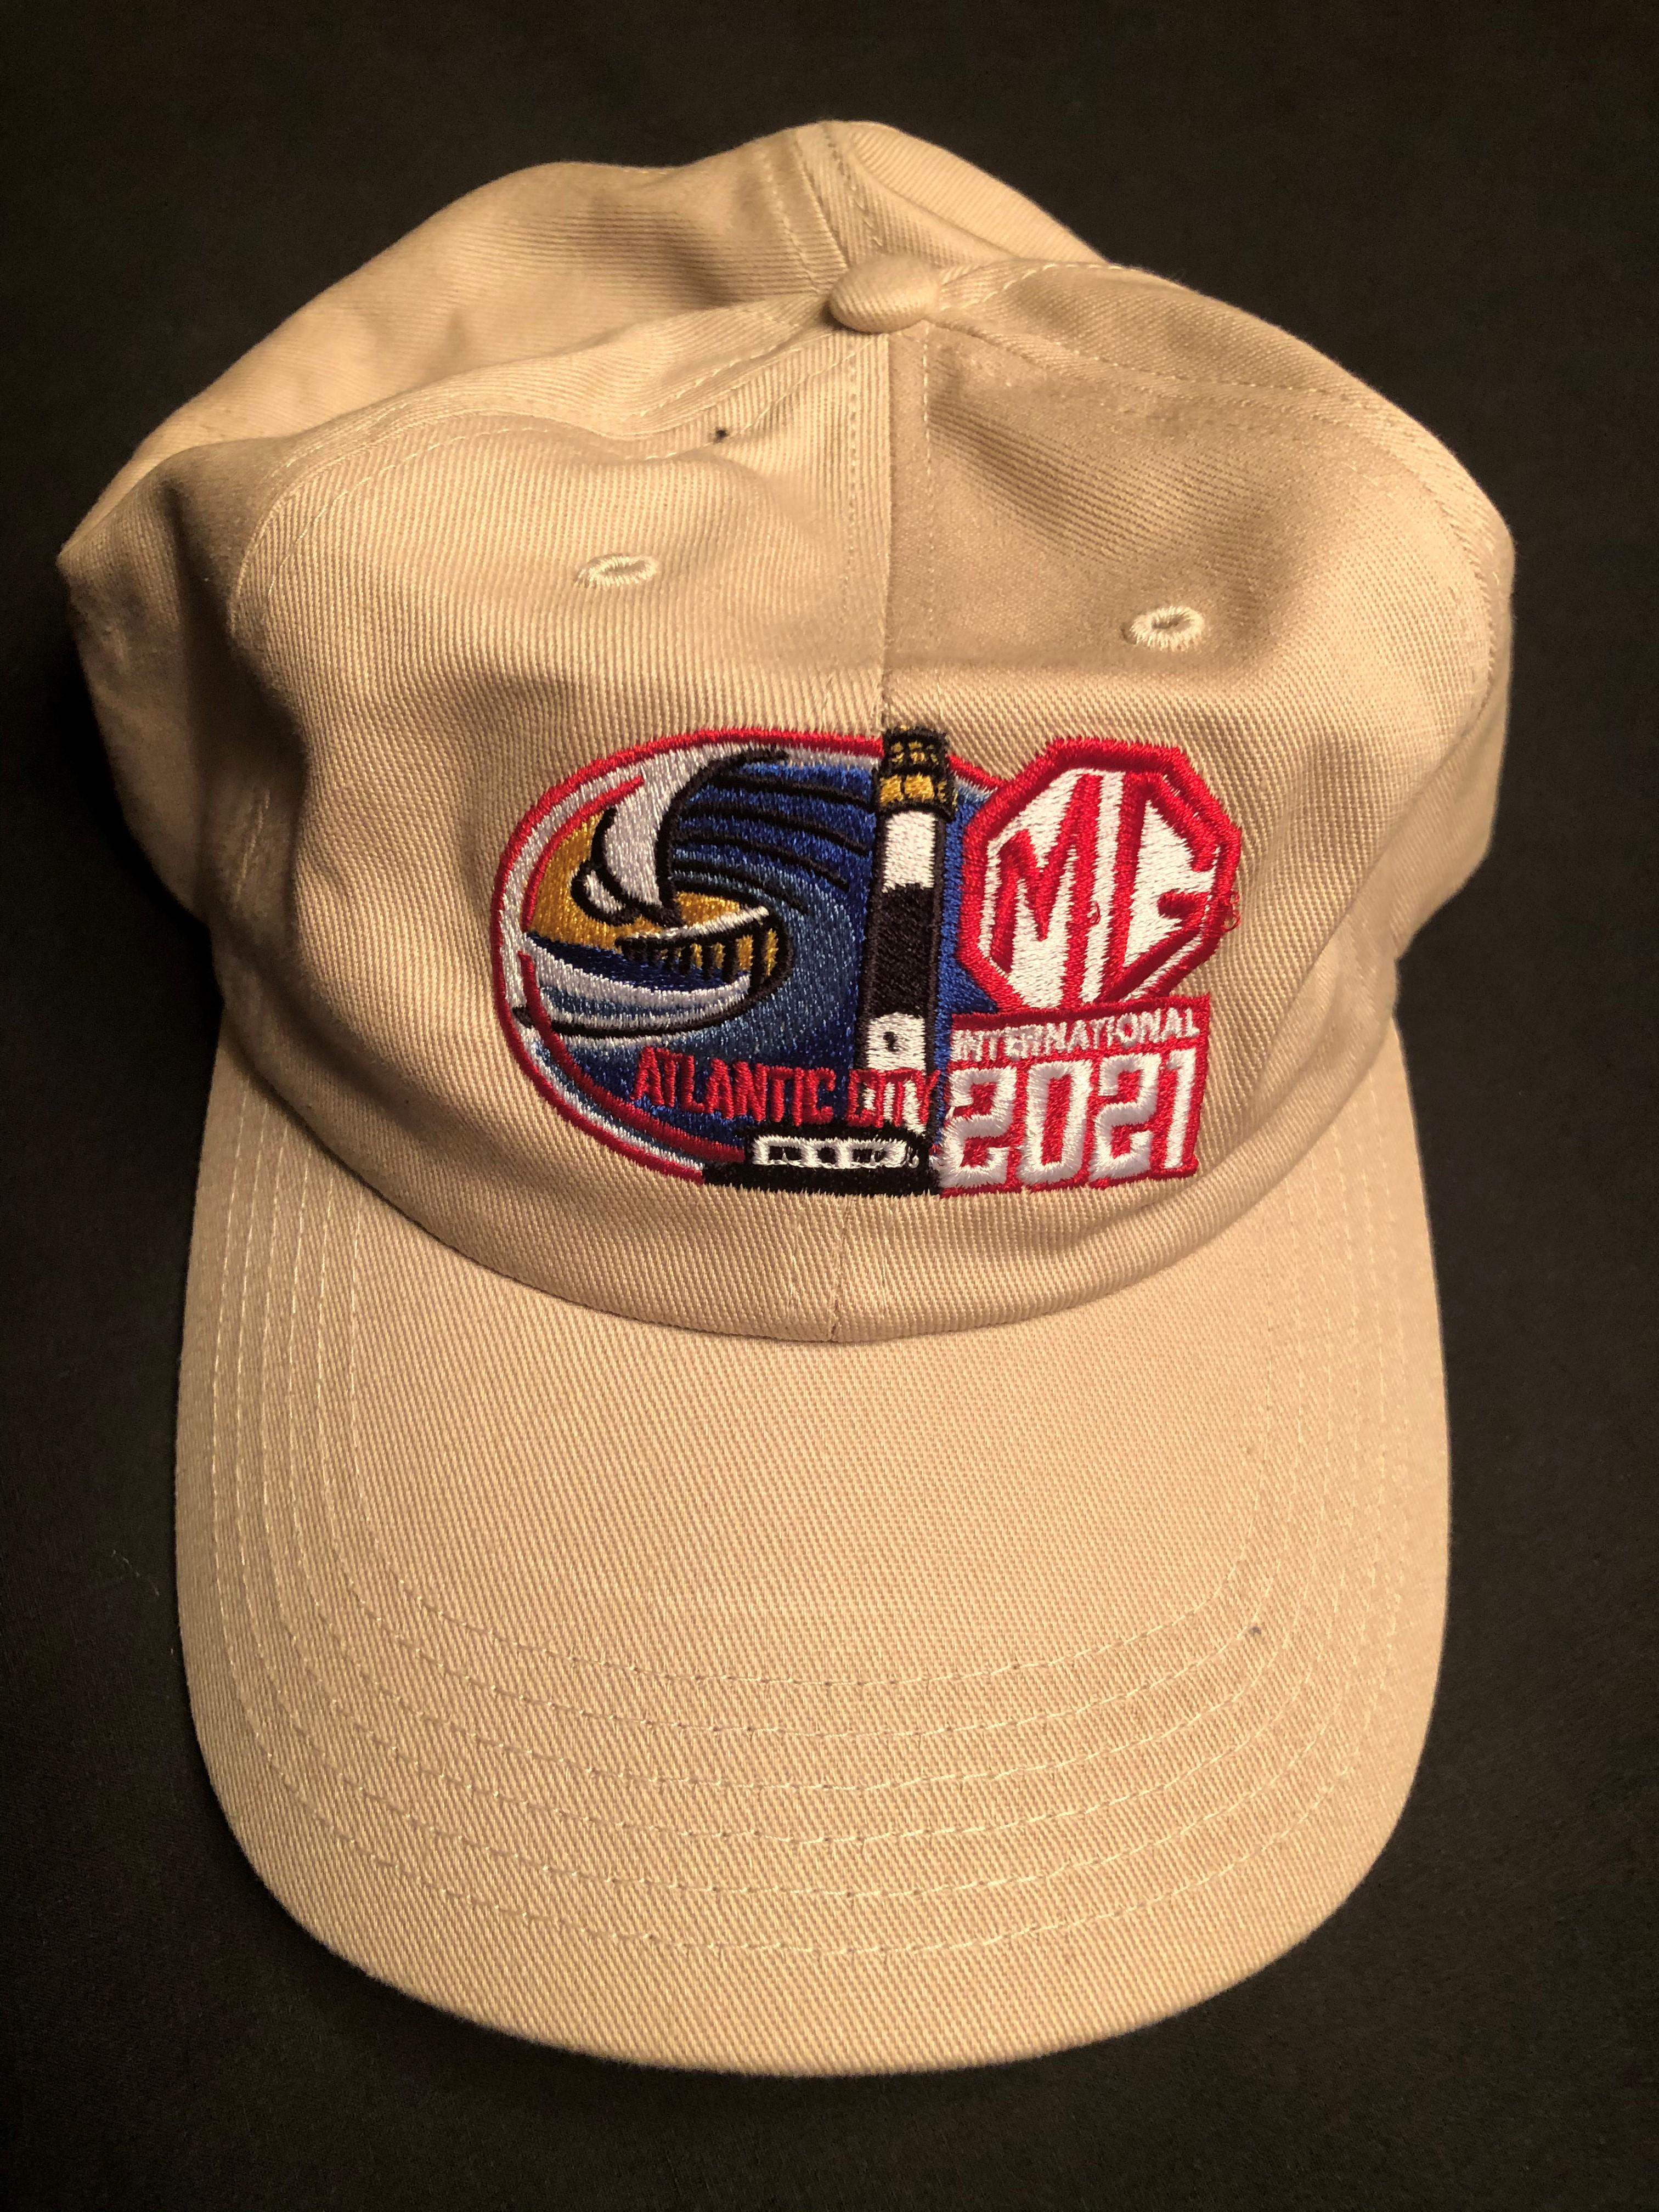 MG International 2021 Hat